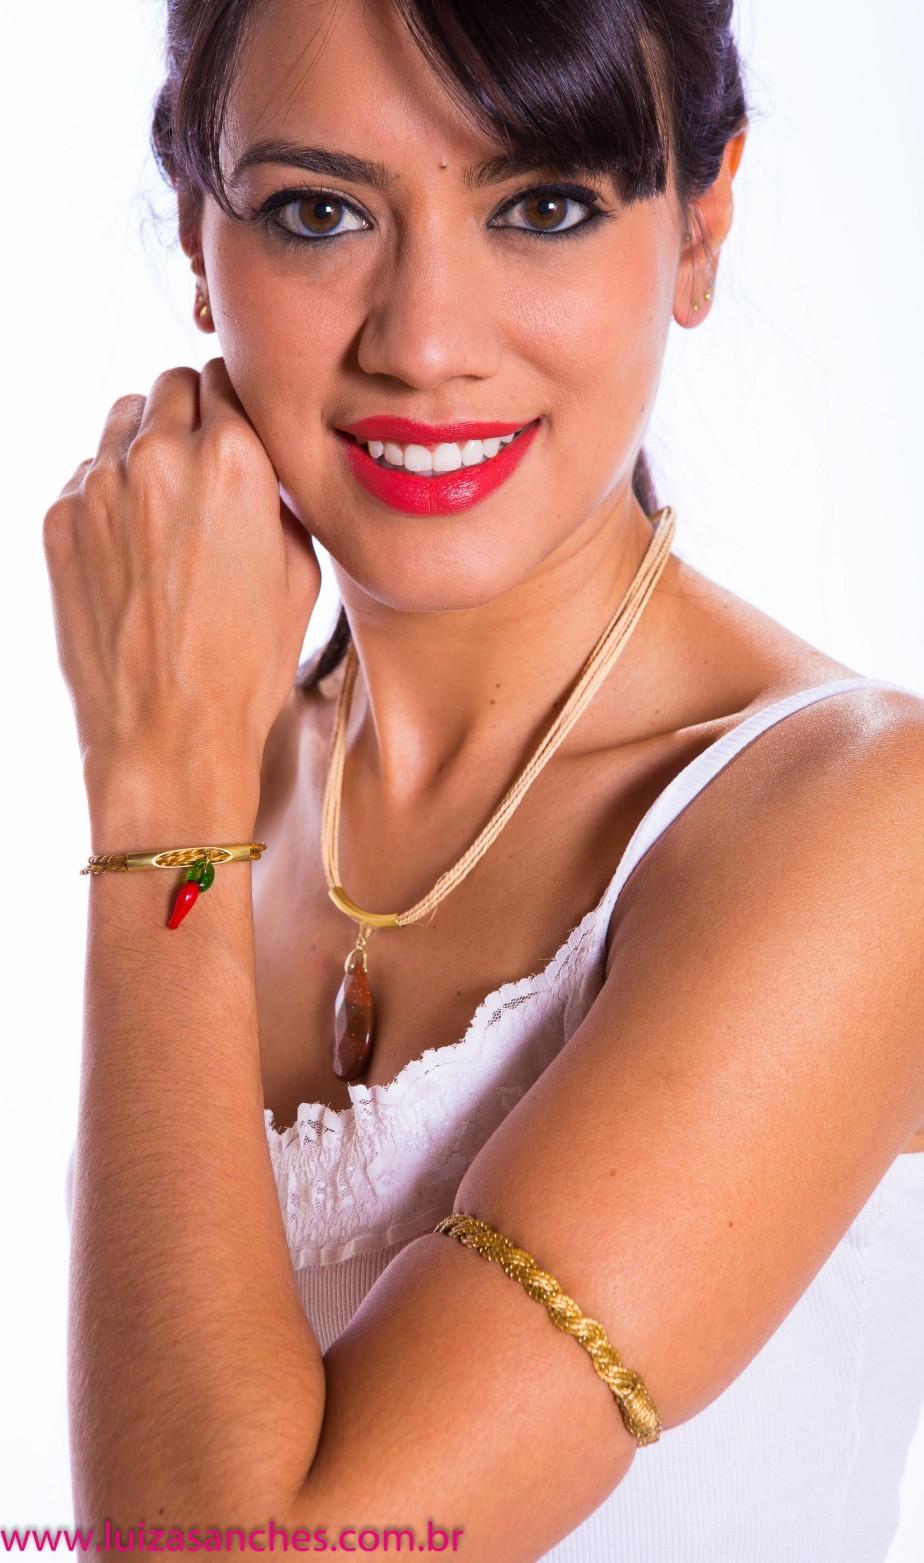 Blog da Luiza Sanches (2)